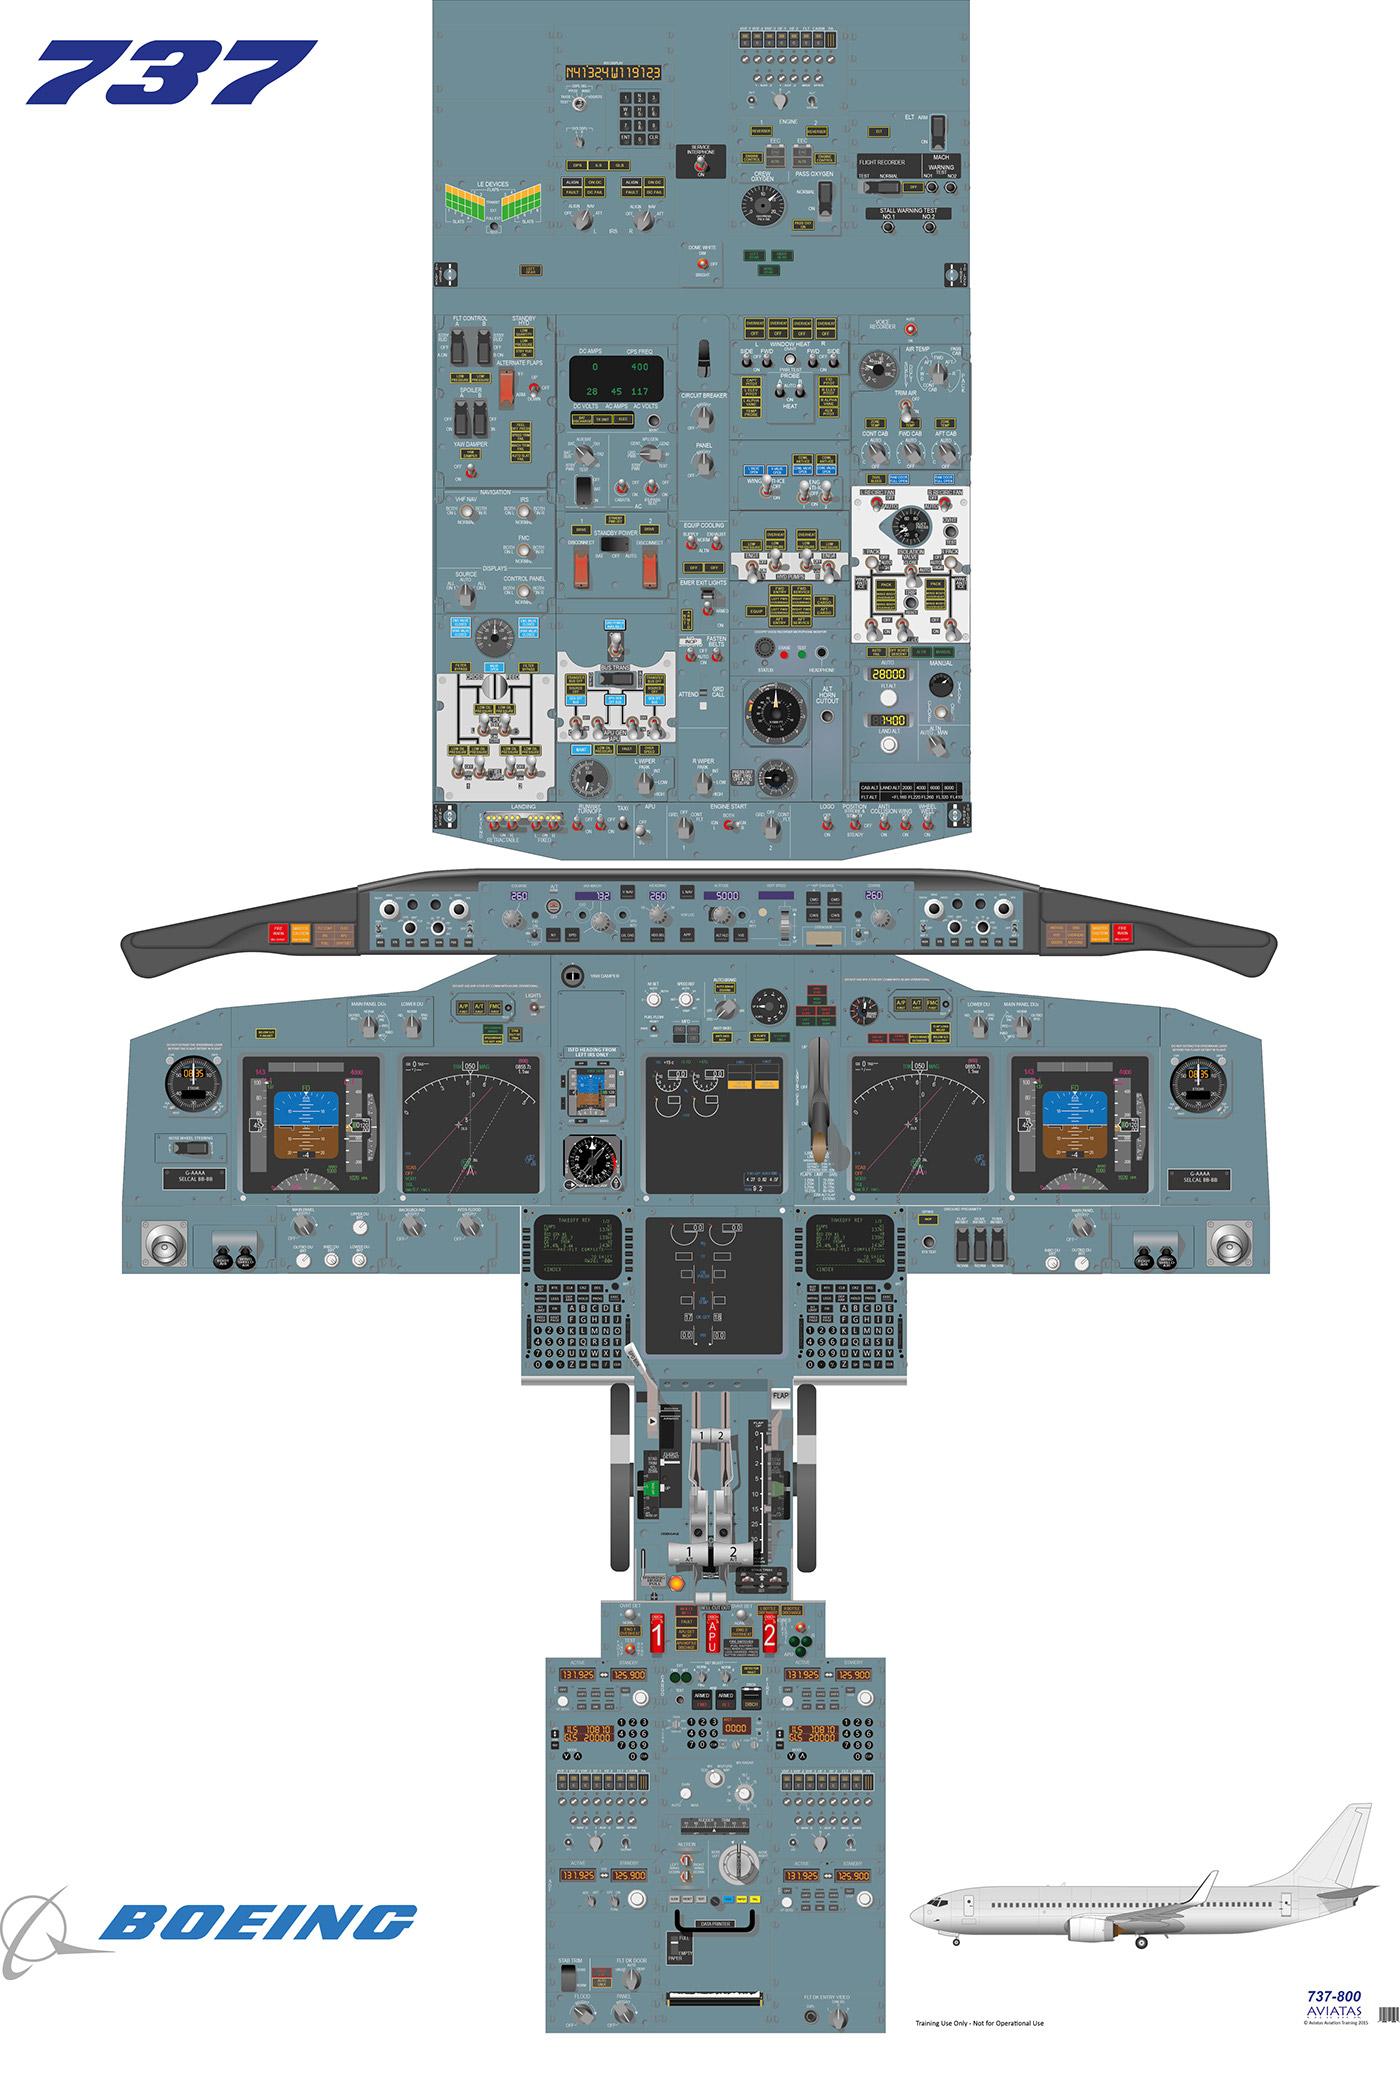 Boeing 737800 Cockpit on Behance